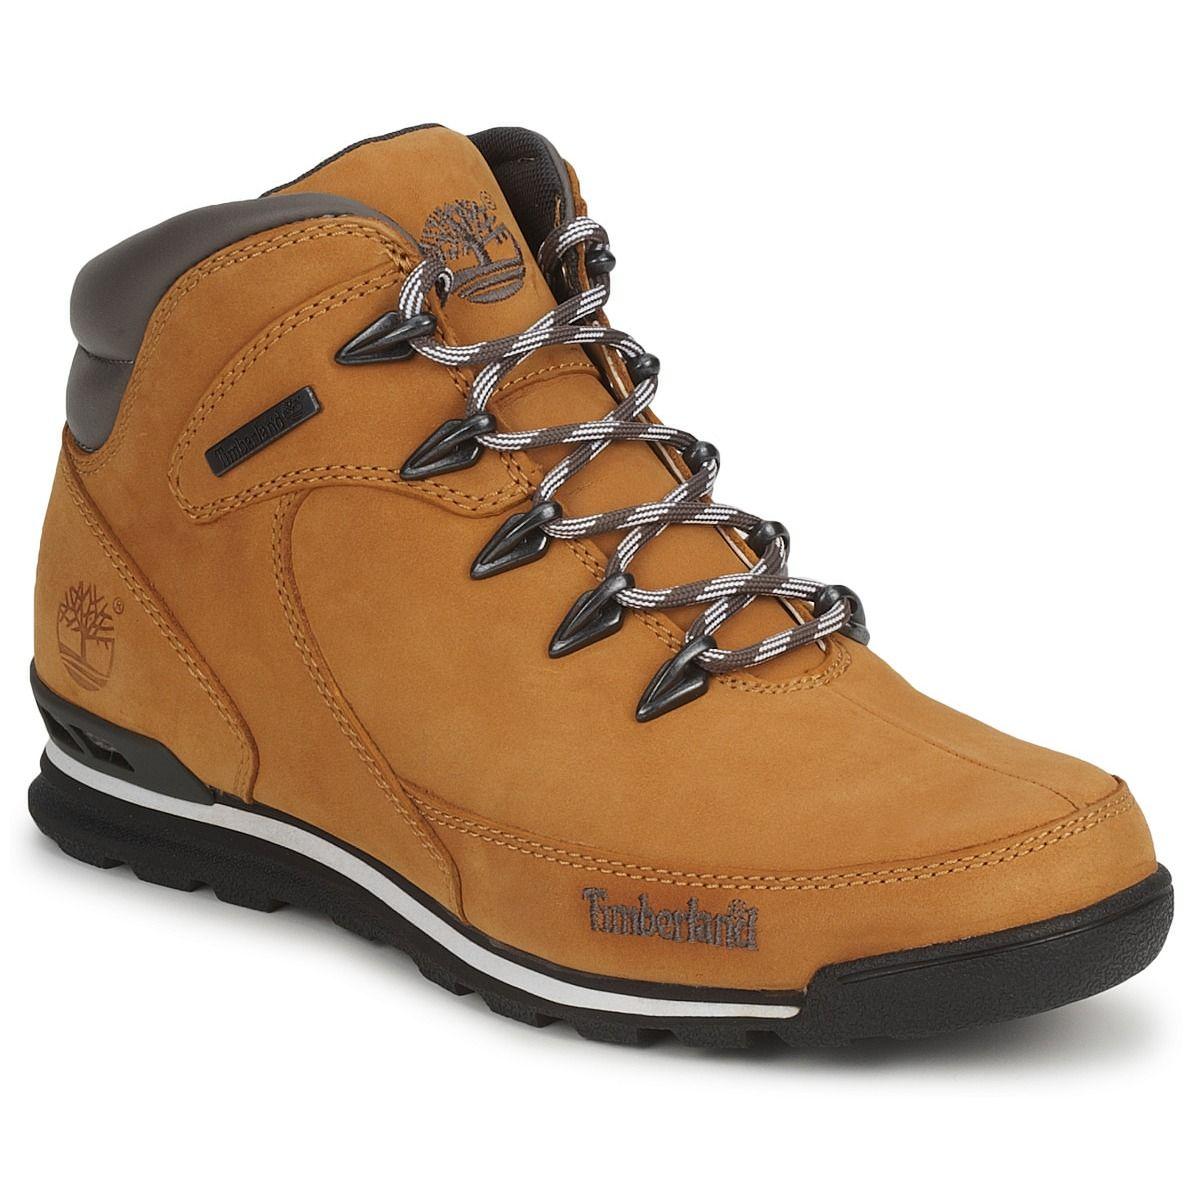 Momento Sympton estudiar  Rebajas Timberland EK EURO ROCK HIKER - Entrega gratuita con Spartoo.es ! |  Zapatos hombre, Zapatos hombre casual, Botas timberland hombre